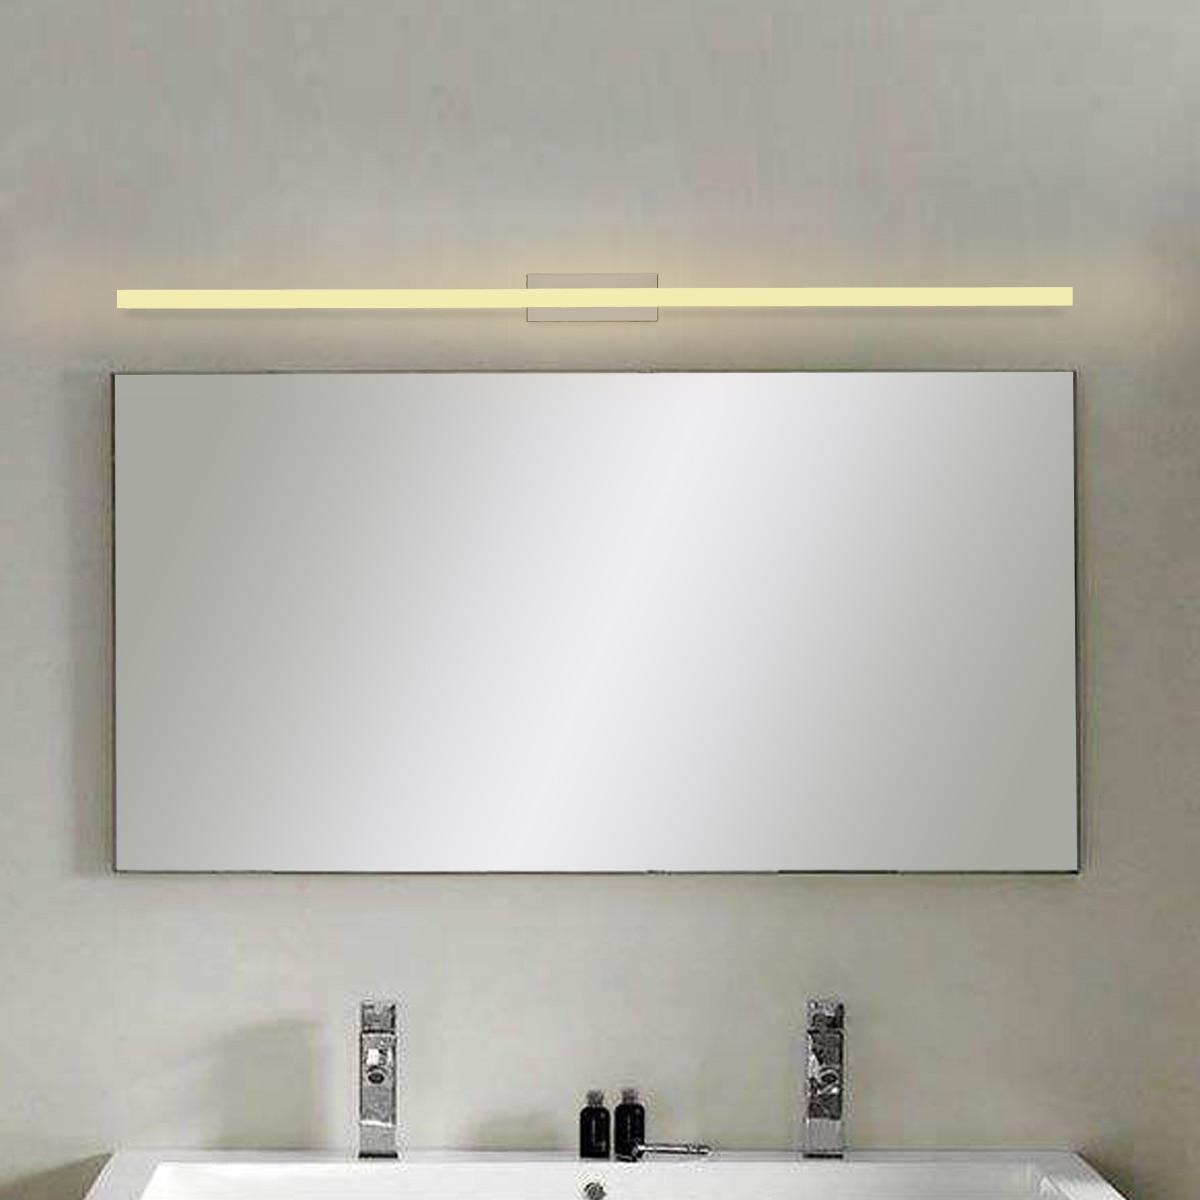 Modern 80cm LED Mirror Light Bathroom Warm White /white Washroom Front Mirror Lamp Fixtures Makeup Mirror Light 85-265V